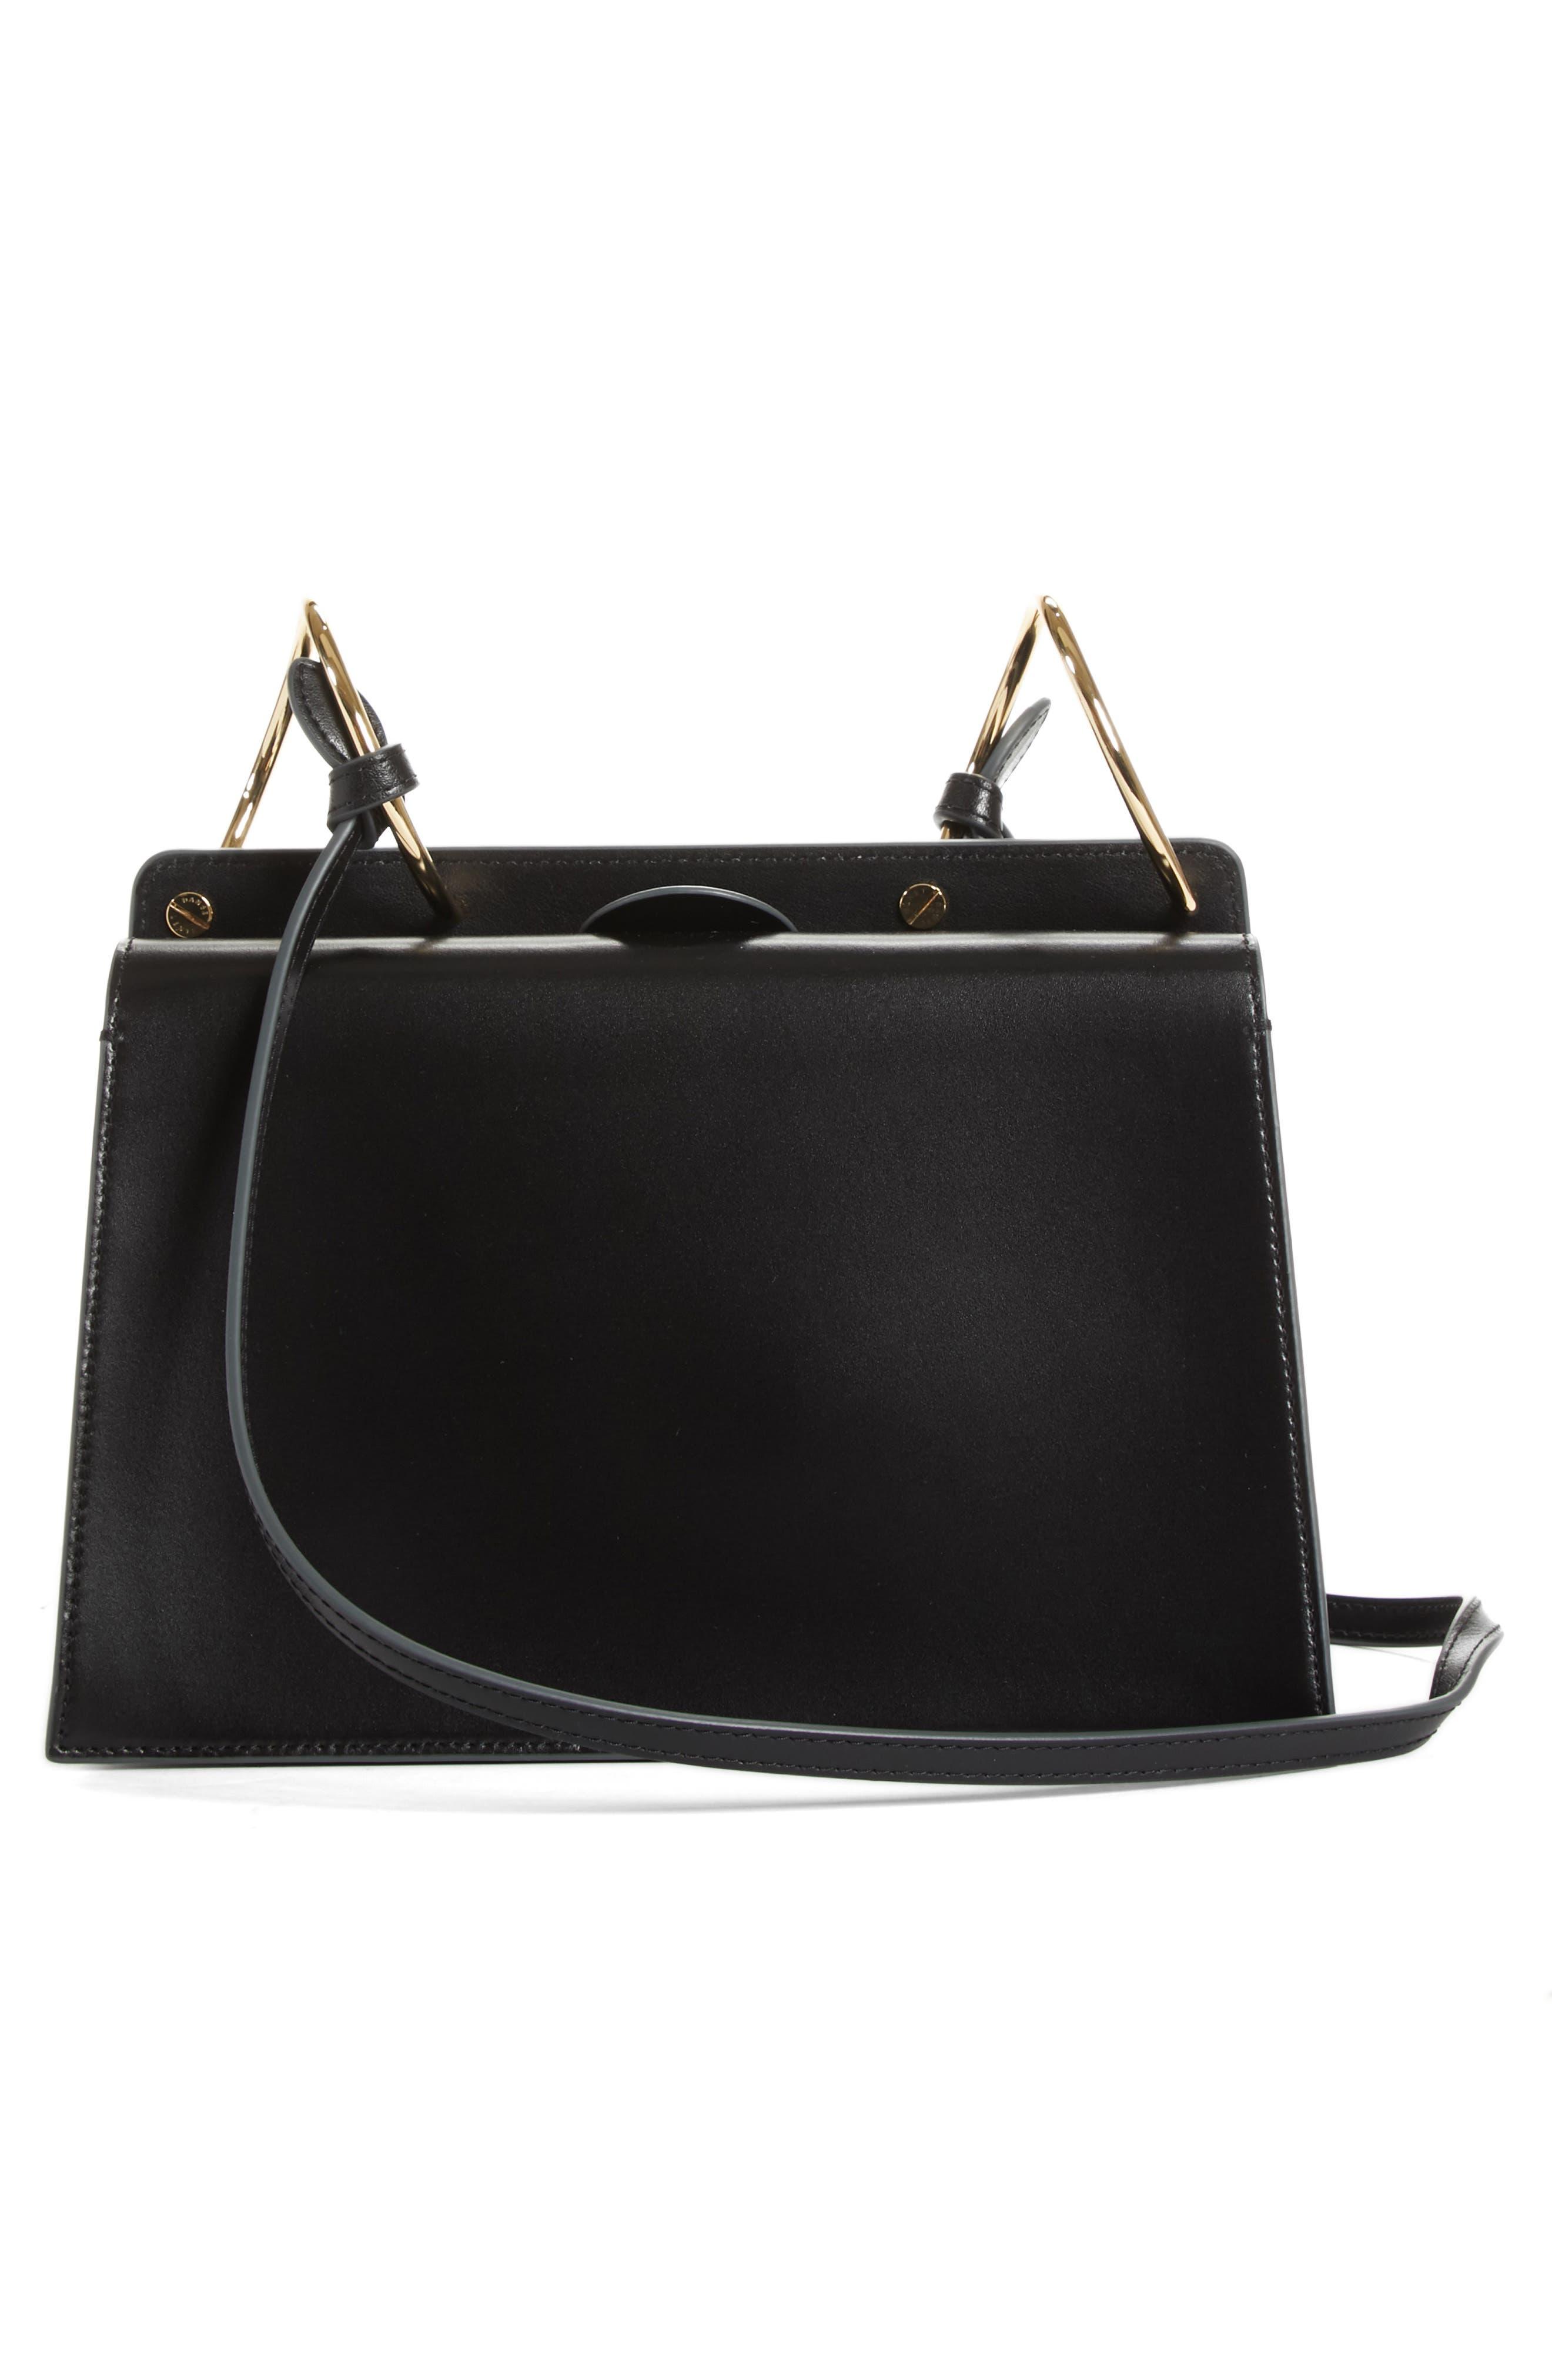 Phoebe Leather Crossbody Bag,                             Alternate thumbnail 3, color,                             Black